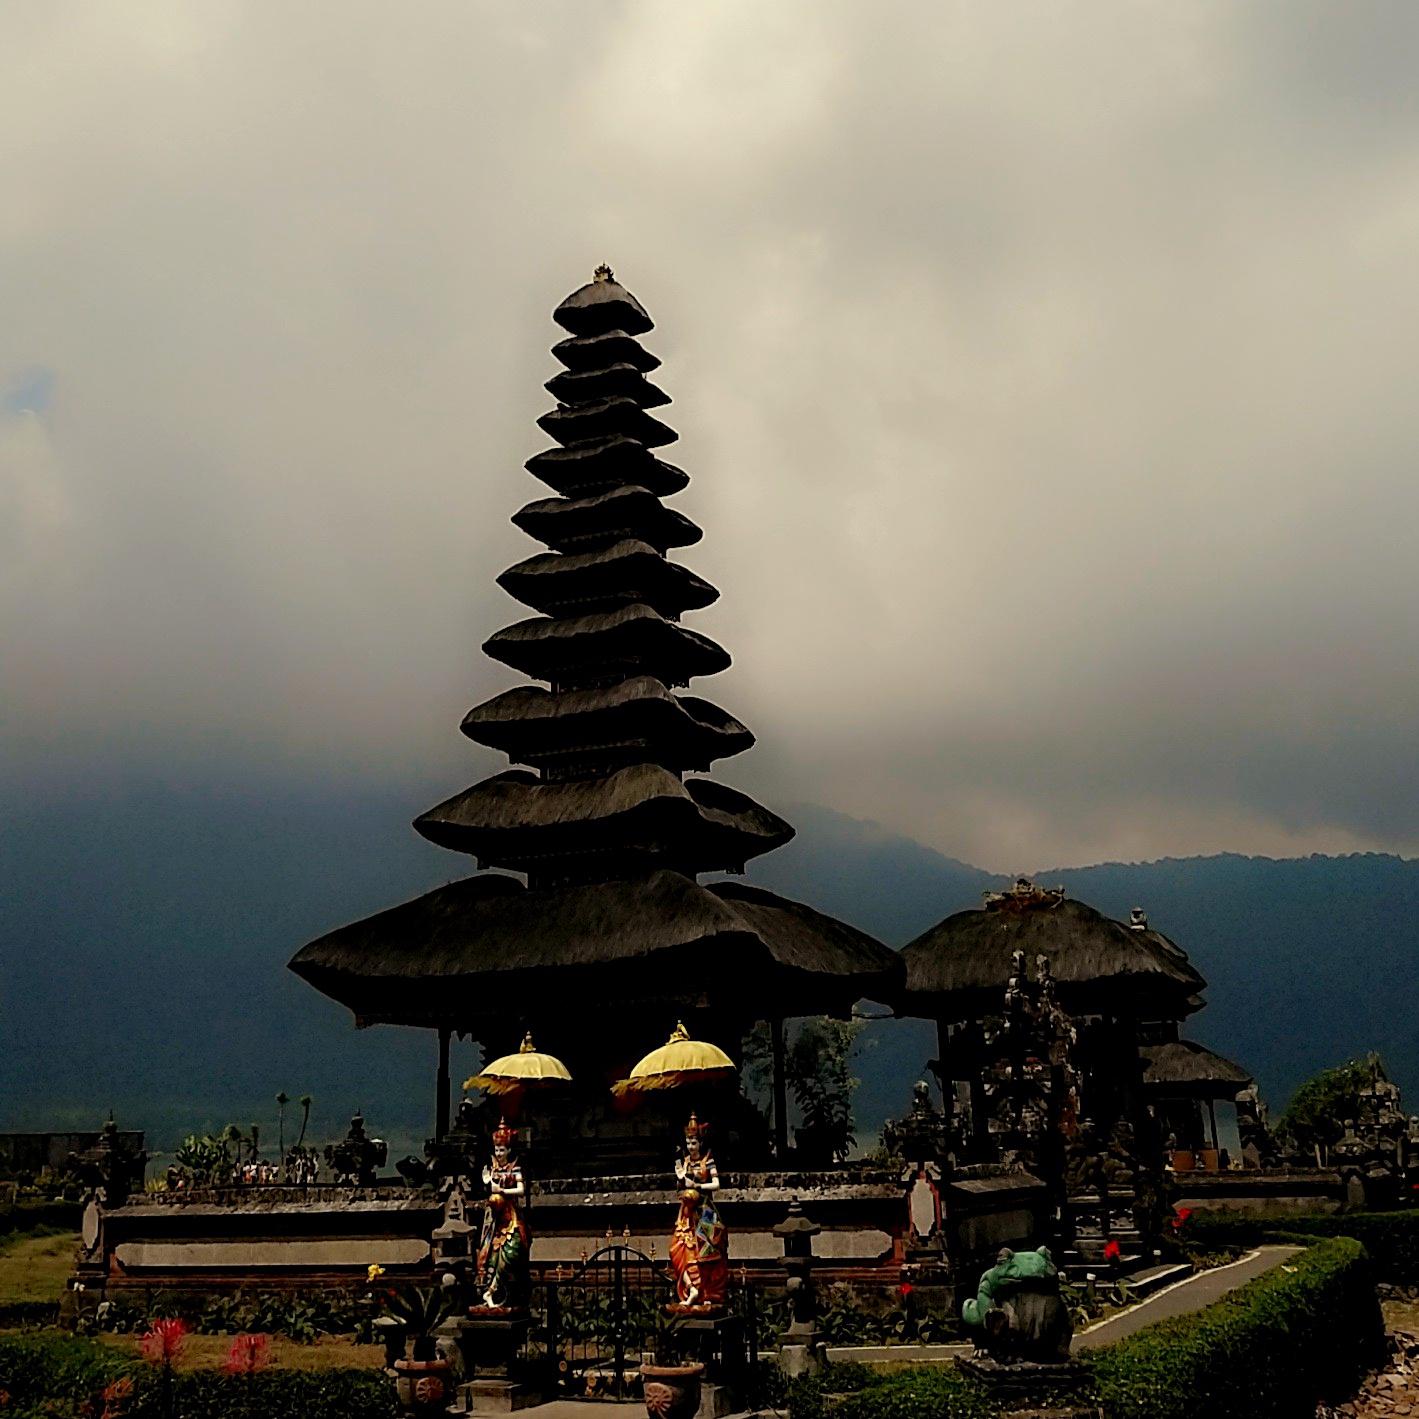 08 Objek Wisata Terkenal Keren Tabanan Bali 2017 Yuk Mampir